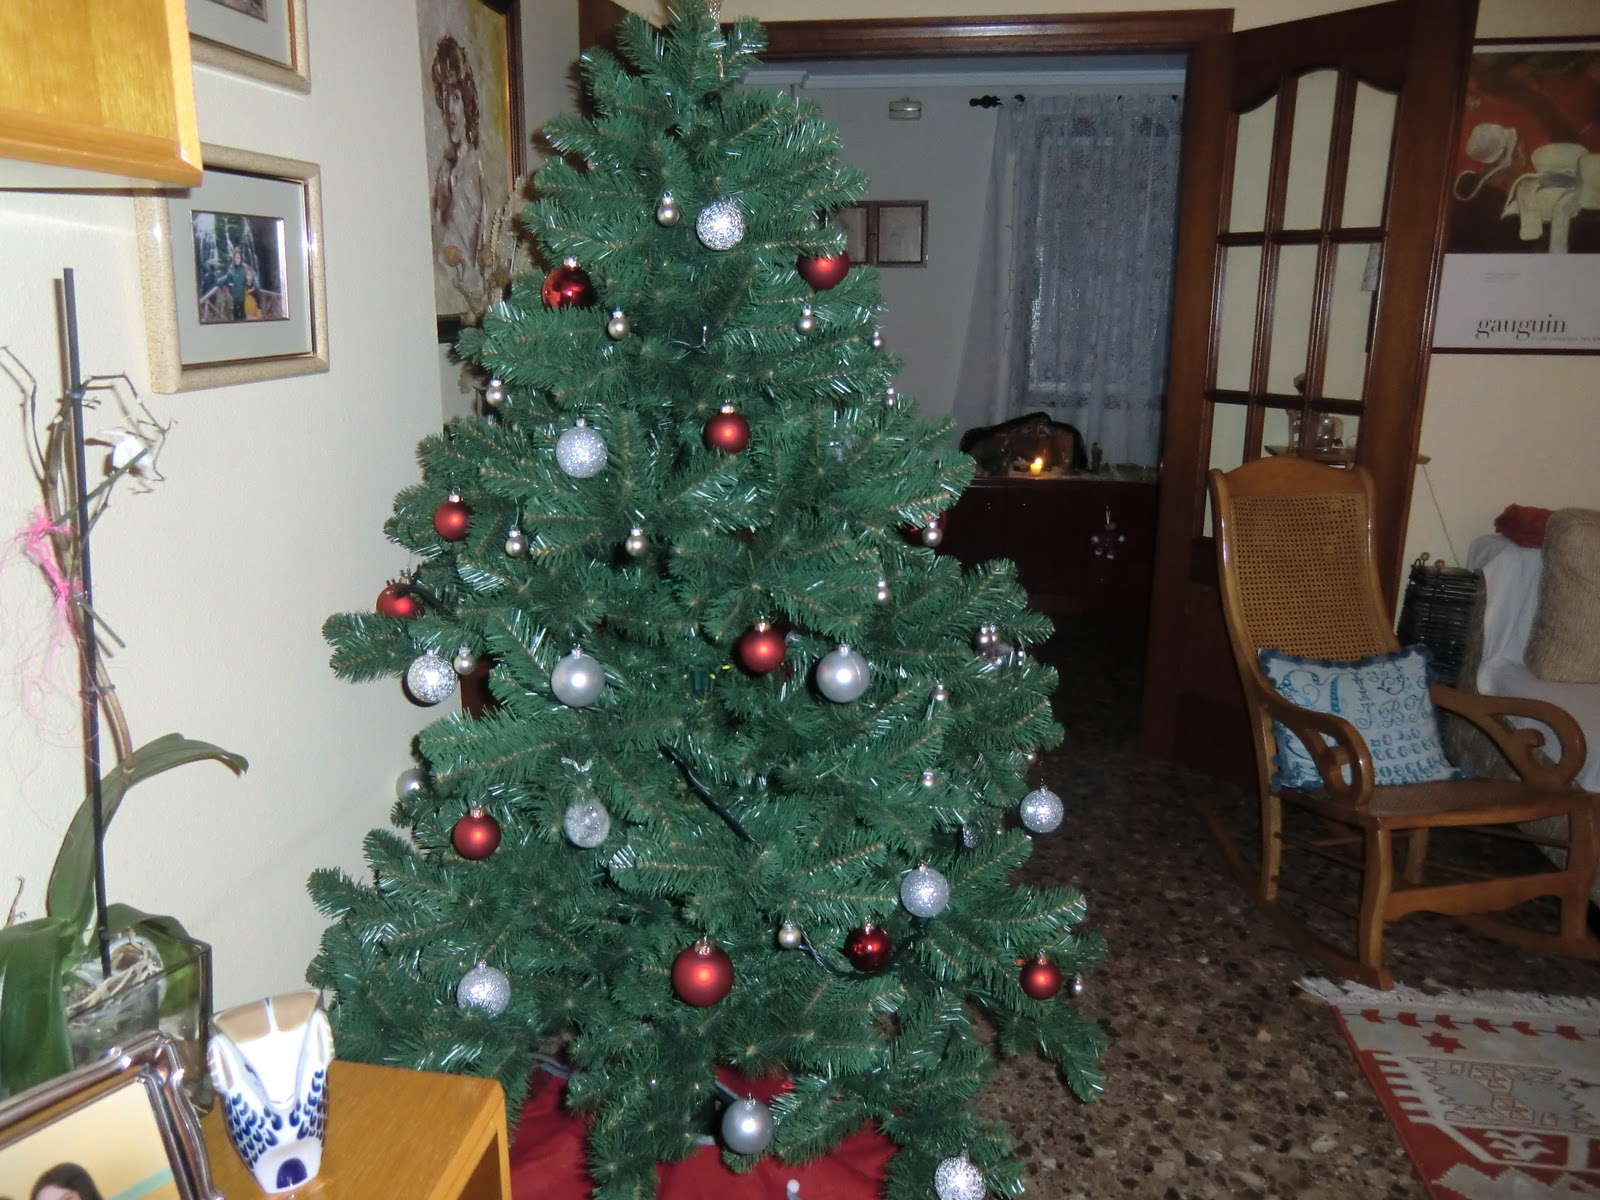 Tatumany la navidad en casa - Arbol de navidad en casa ...